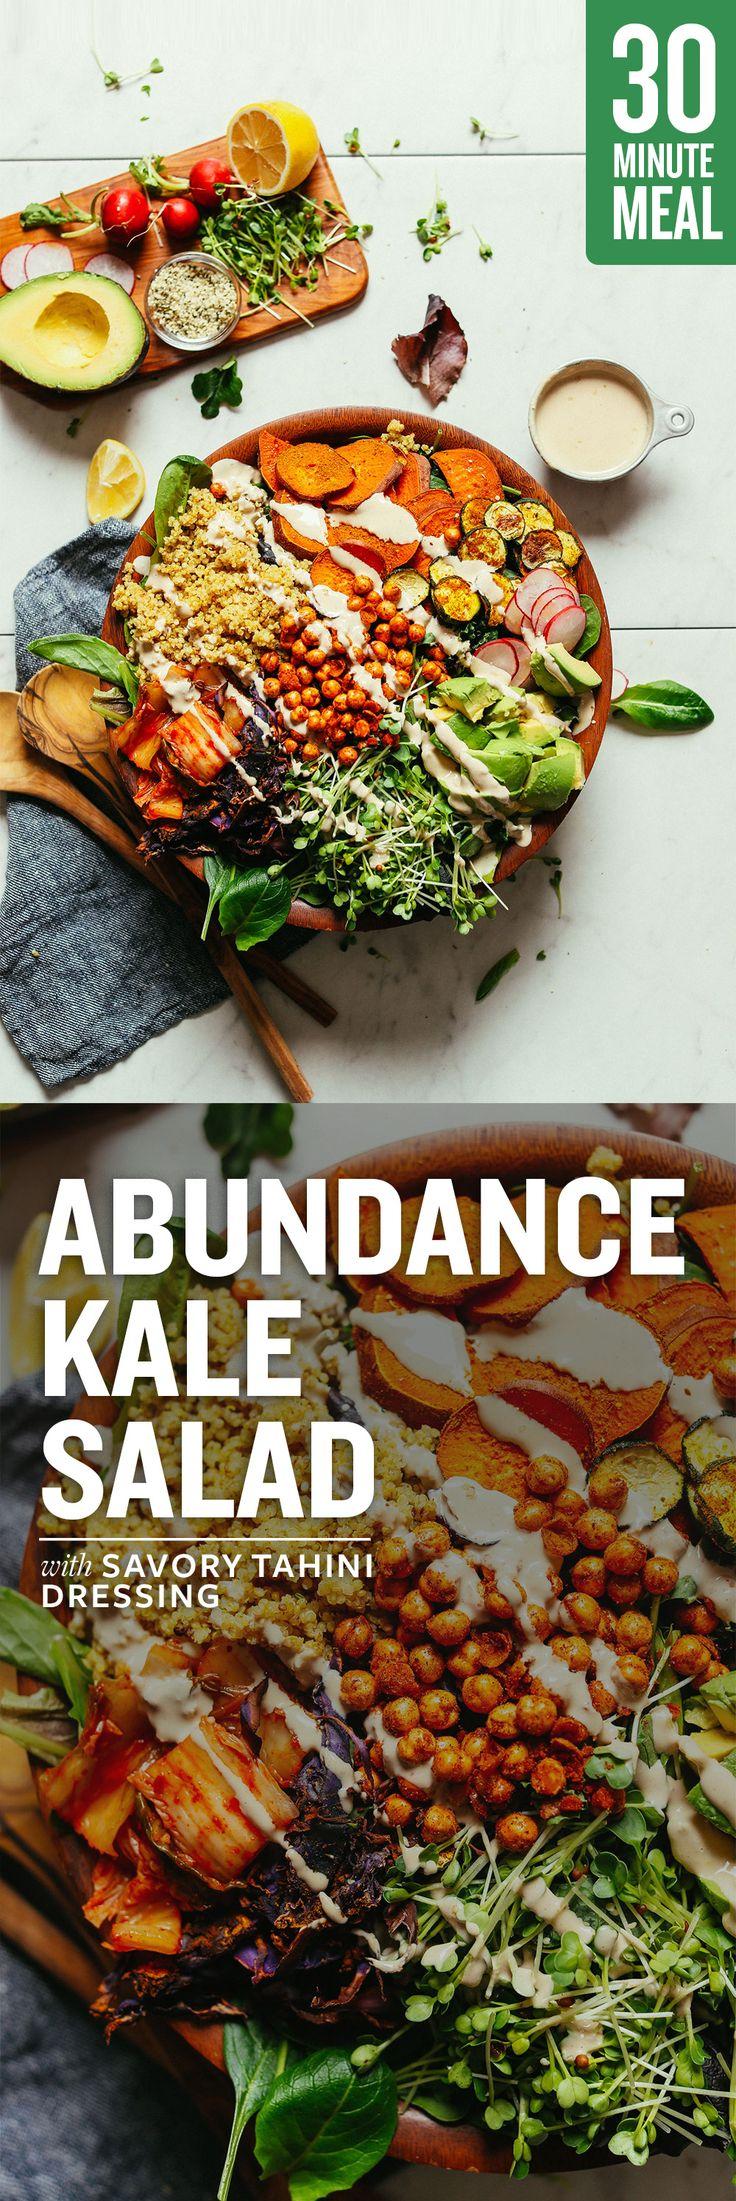 ABUNDANCE Green Salad with Savory Tahini Dressing!